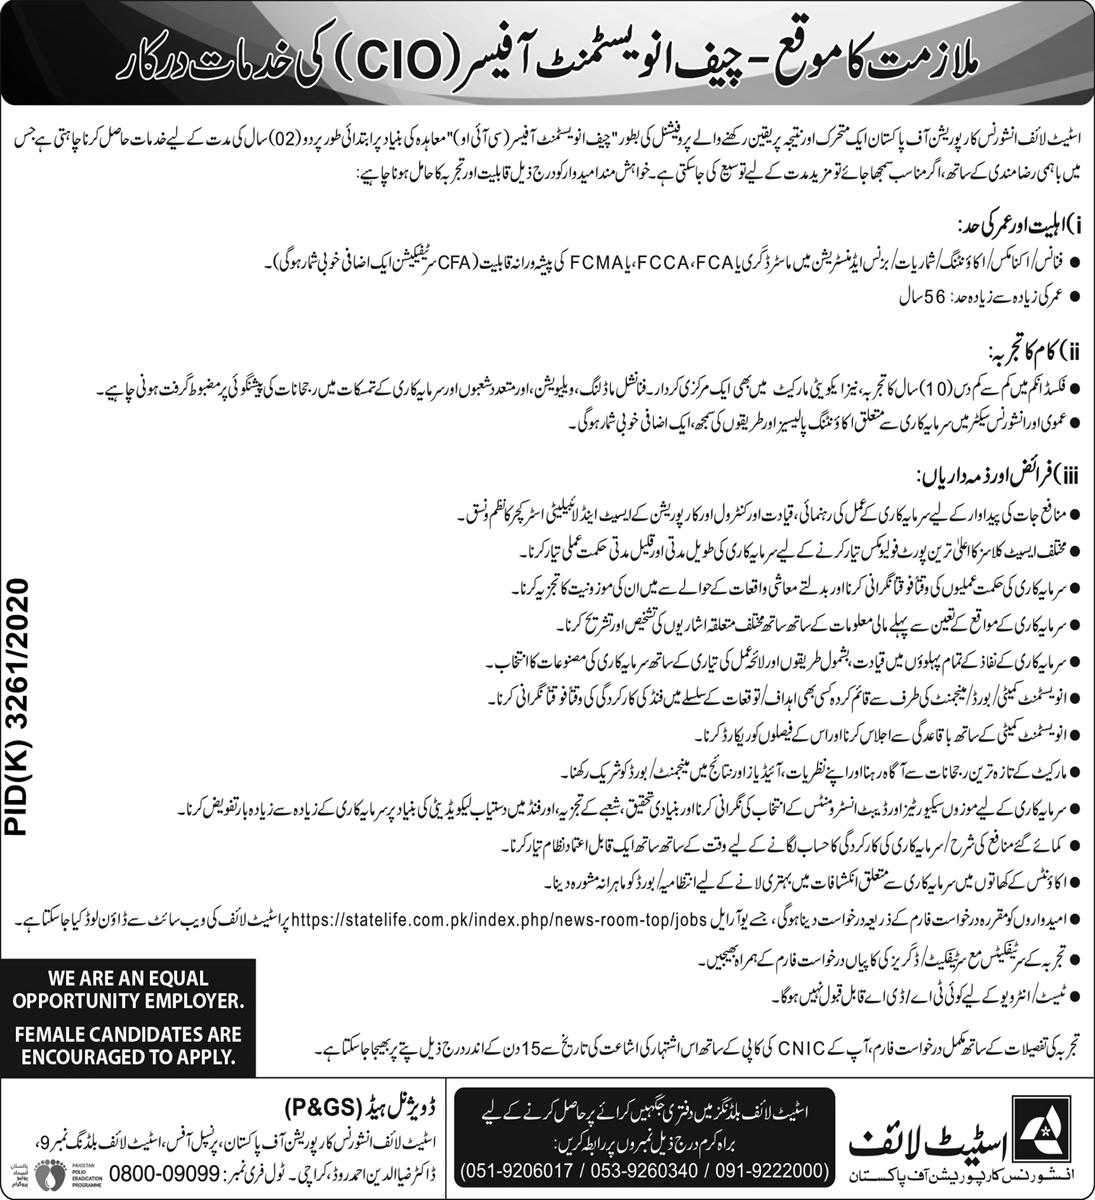 State Life Insurance Corporation of Pak Jobs 2021 Karachi